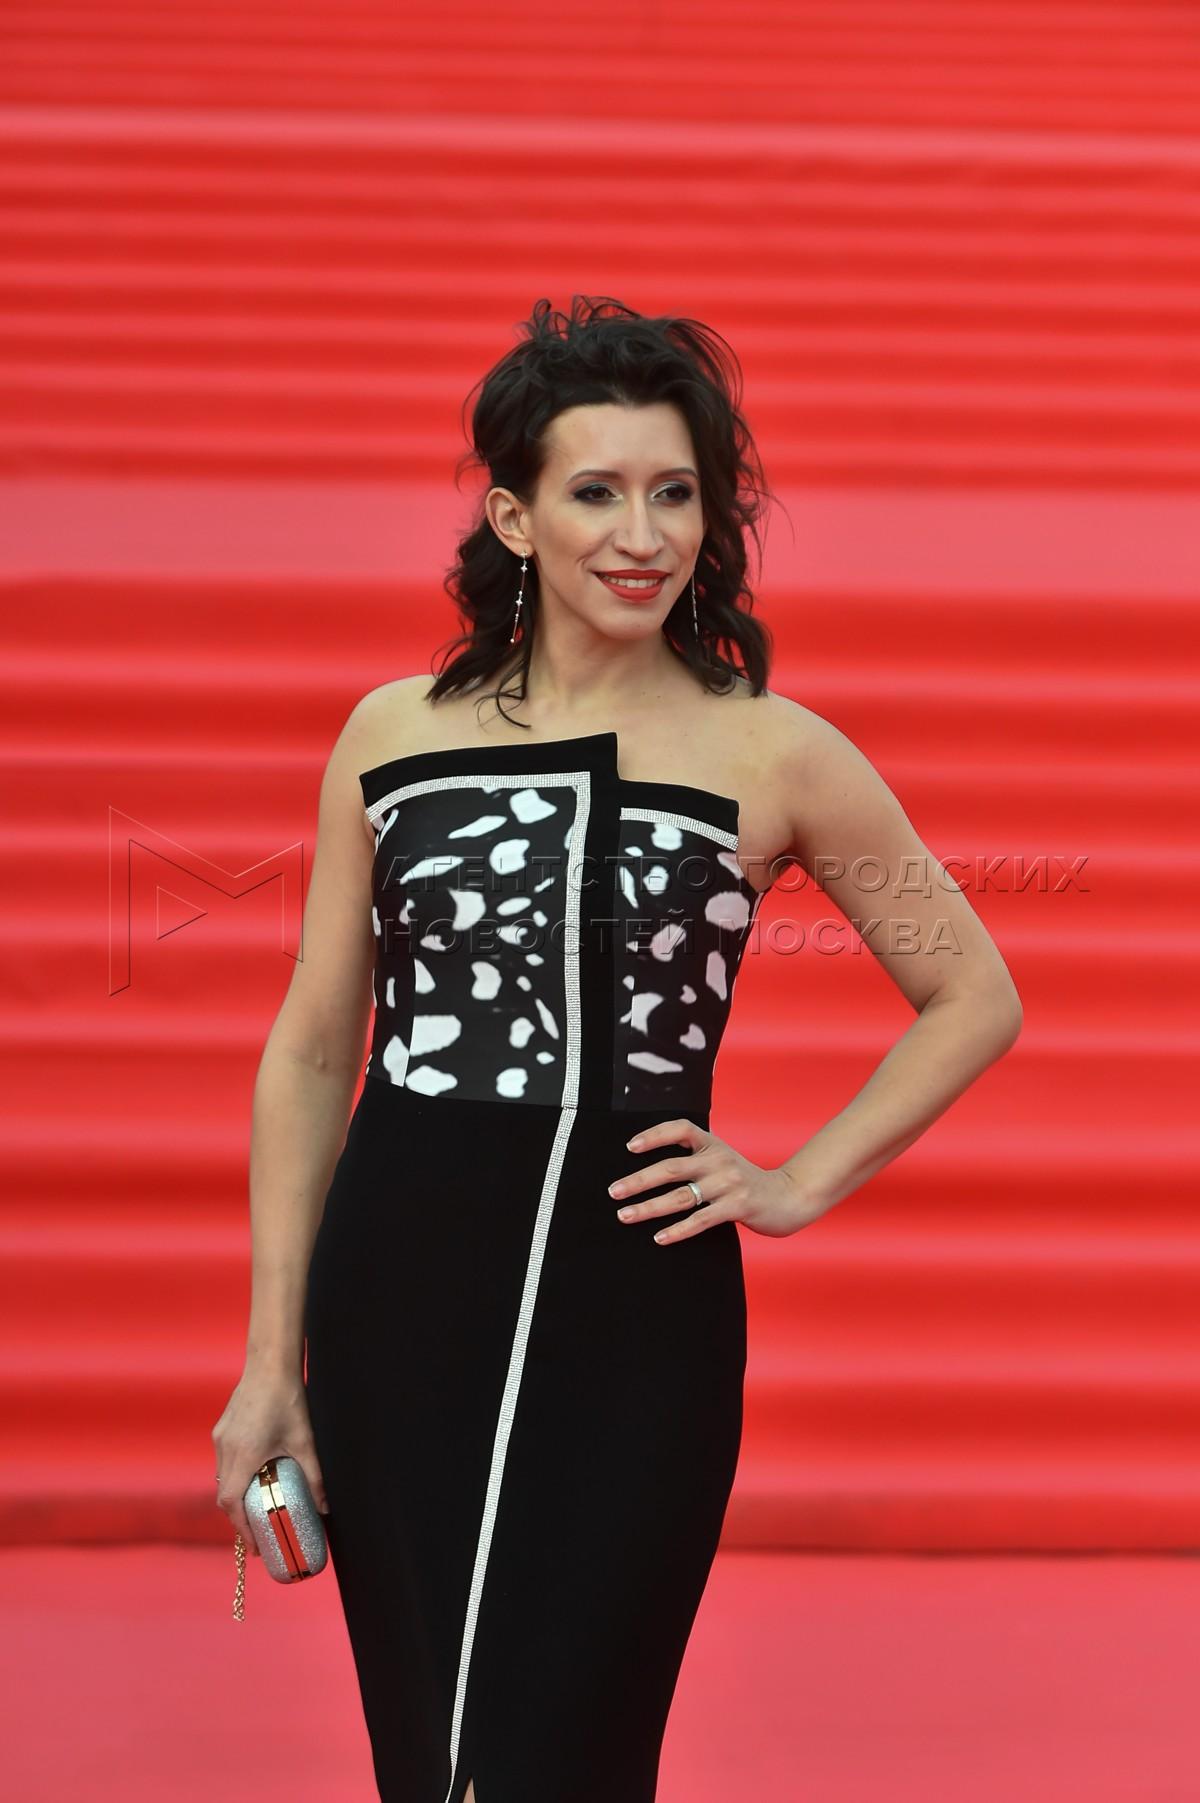 Актриса Елена Борщева на церемонии закрытия 43-го Московского международного кинофестиваля (ММКФ).